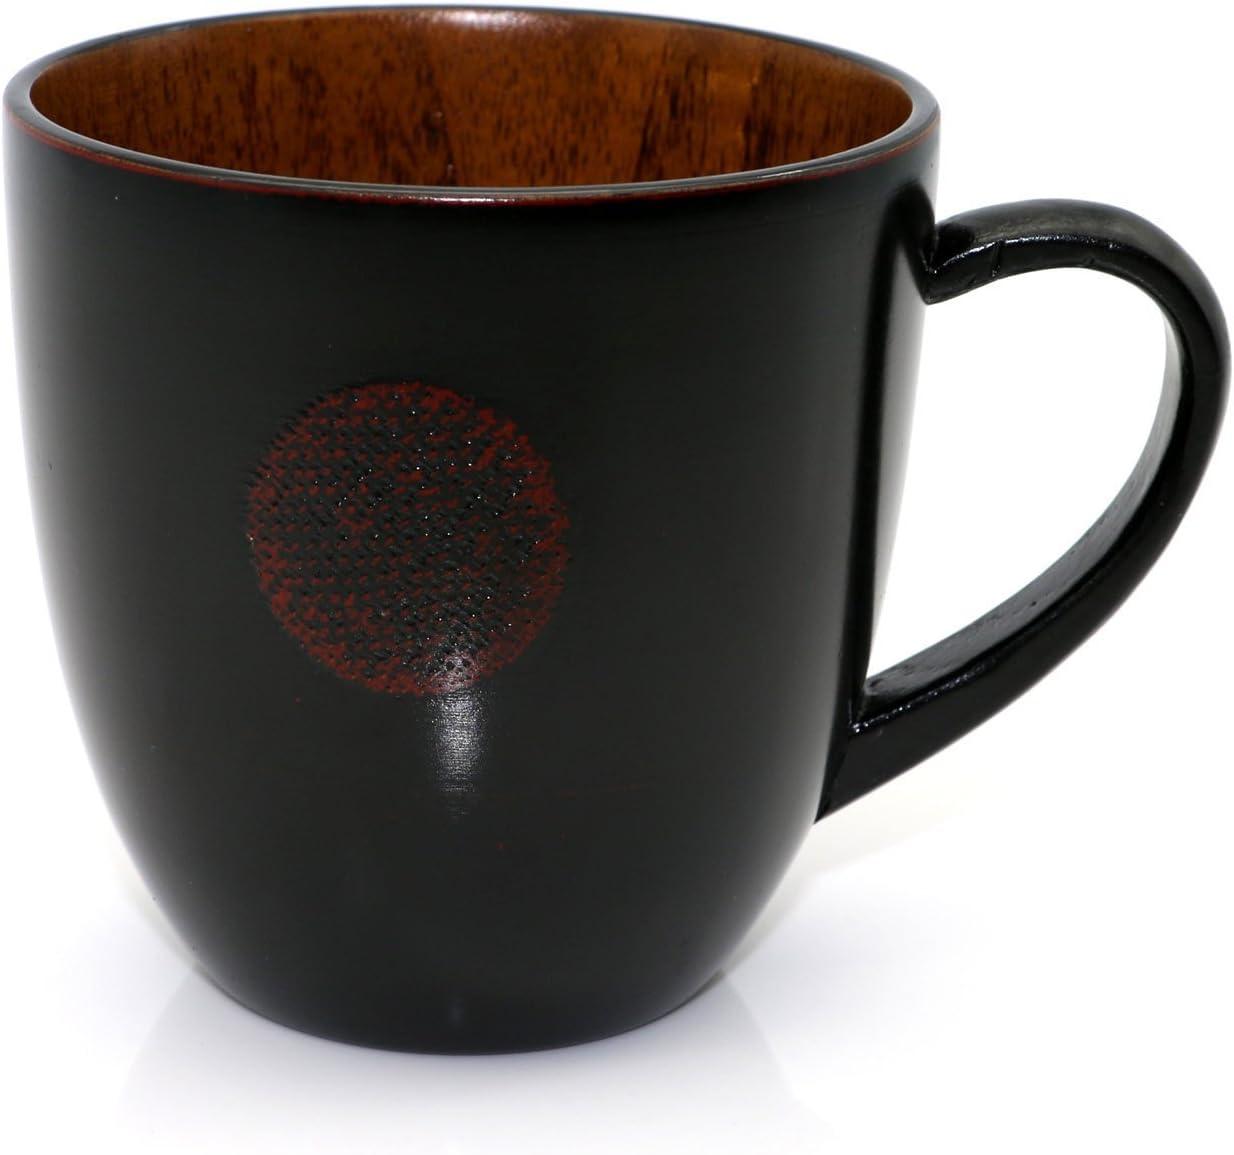 OYL Jujube Wood Coffee Mug,Japanese Beer Mug,Handcraft Dining Milk Cup,Reusable Tea Cup,Scald Proof,Safe and Eco Friendly,300 ml